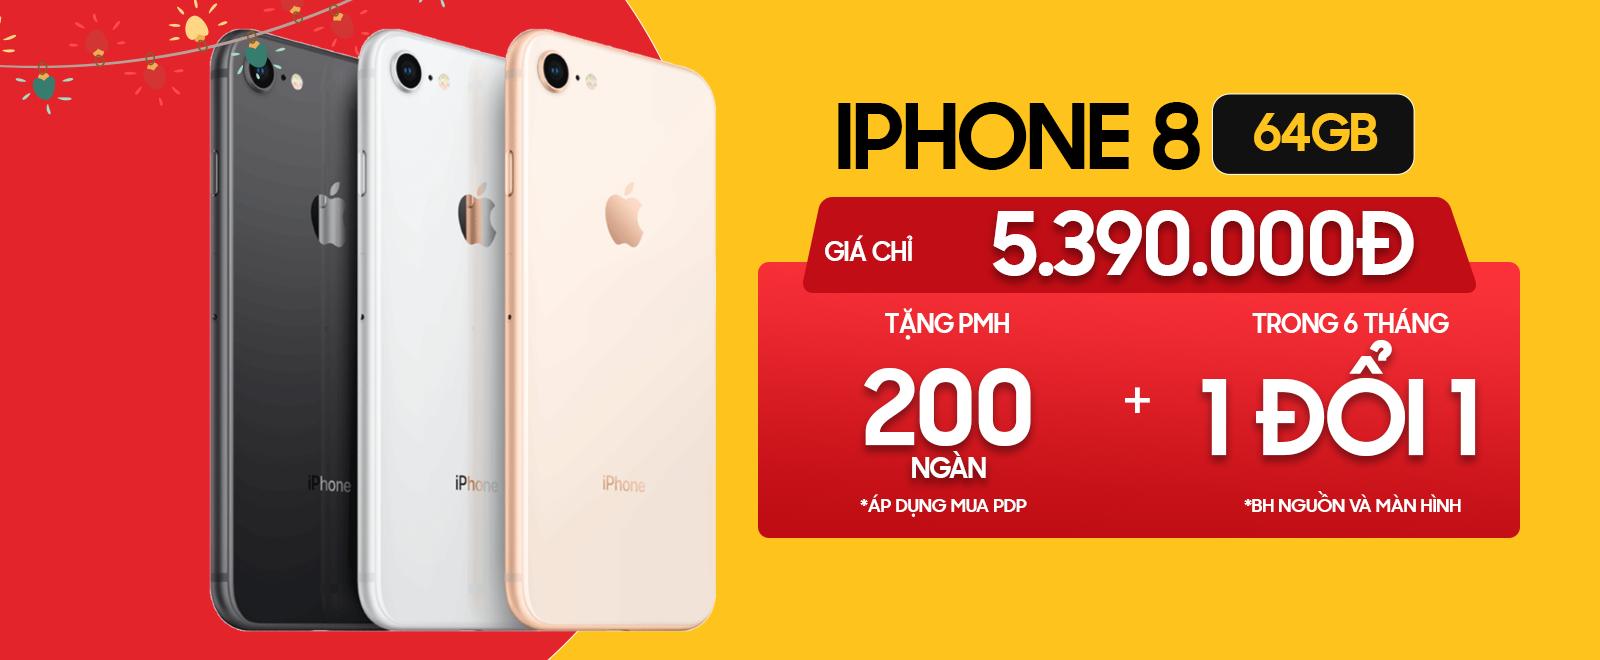 Giá iPhone 8 Chỉ Từ 5.8 triệu